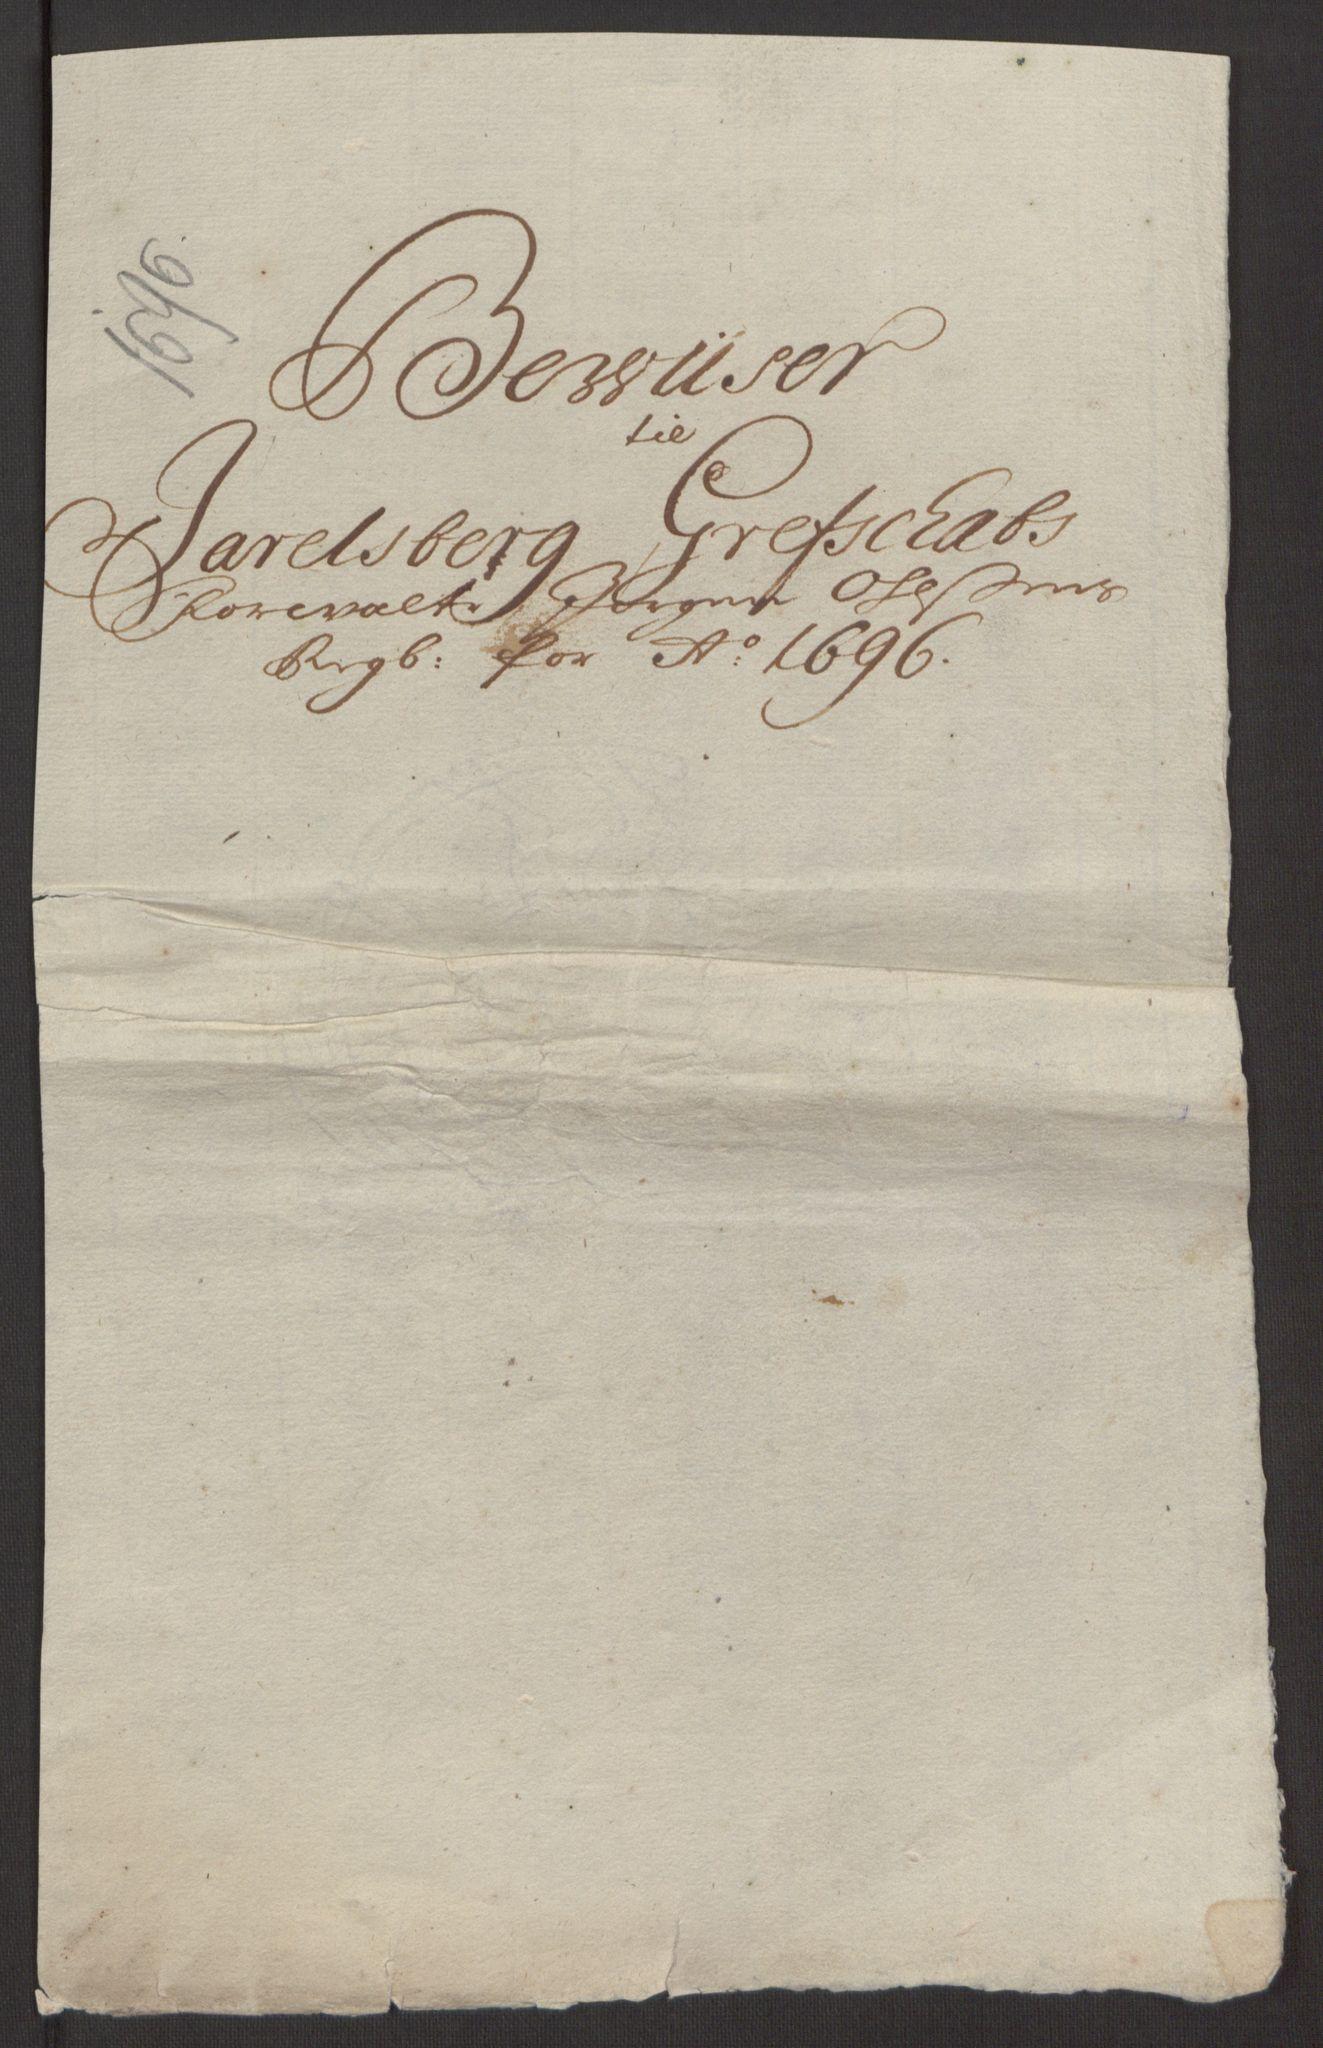 RA, Rentekammeret inntil 1814, Reviderte regnskaper, Fogderegnskap, R32/L1867: Fogderegnskap Jarlsberg grevskap, 1694-1696, s. 310